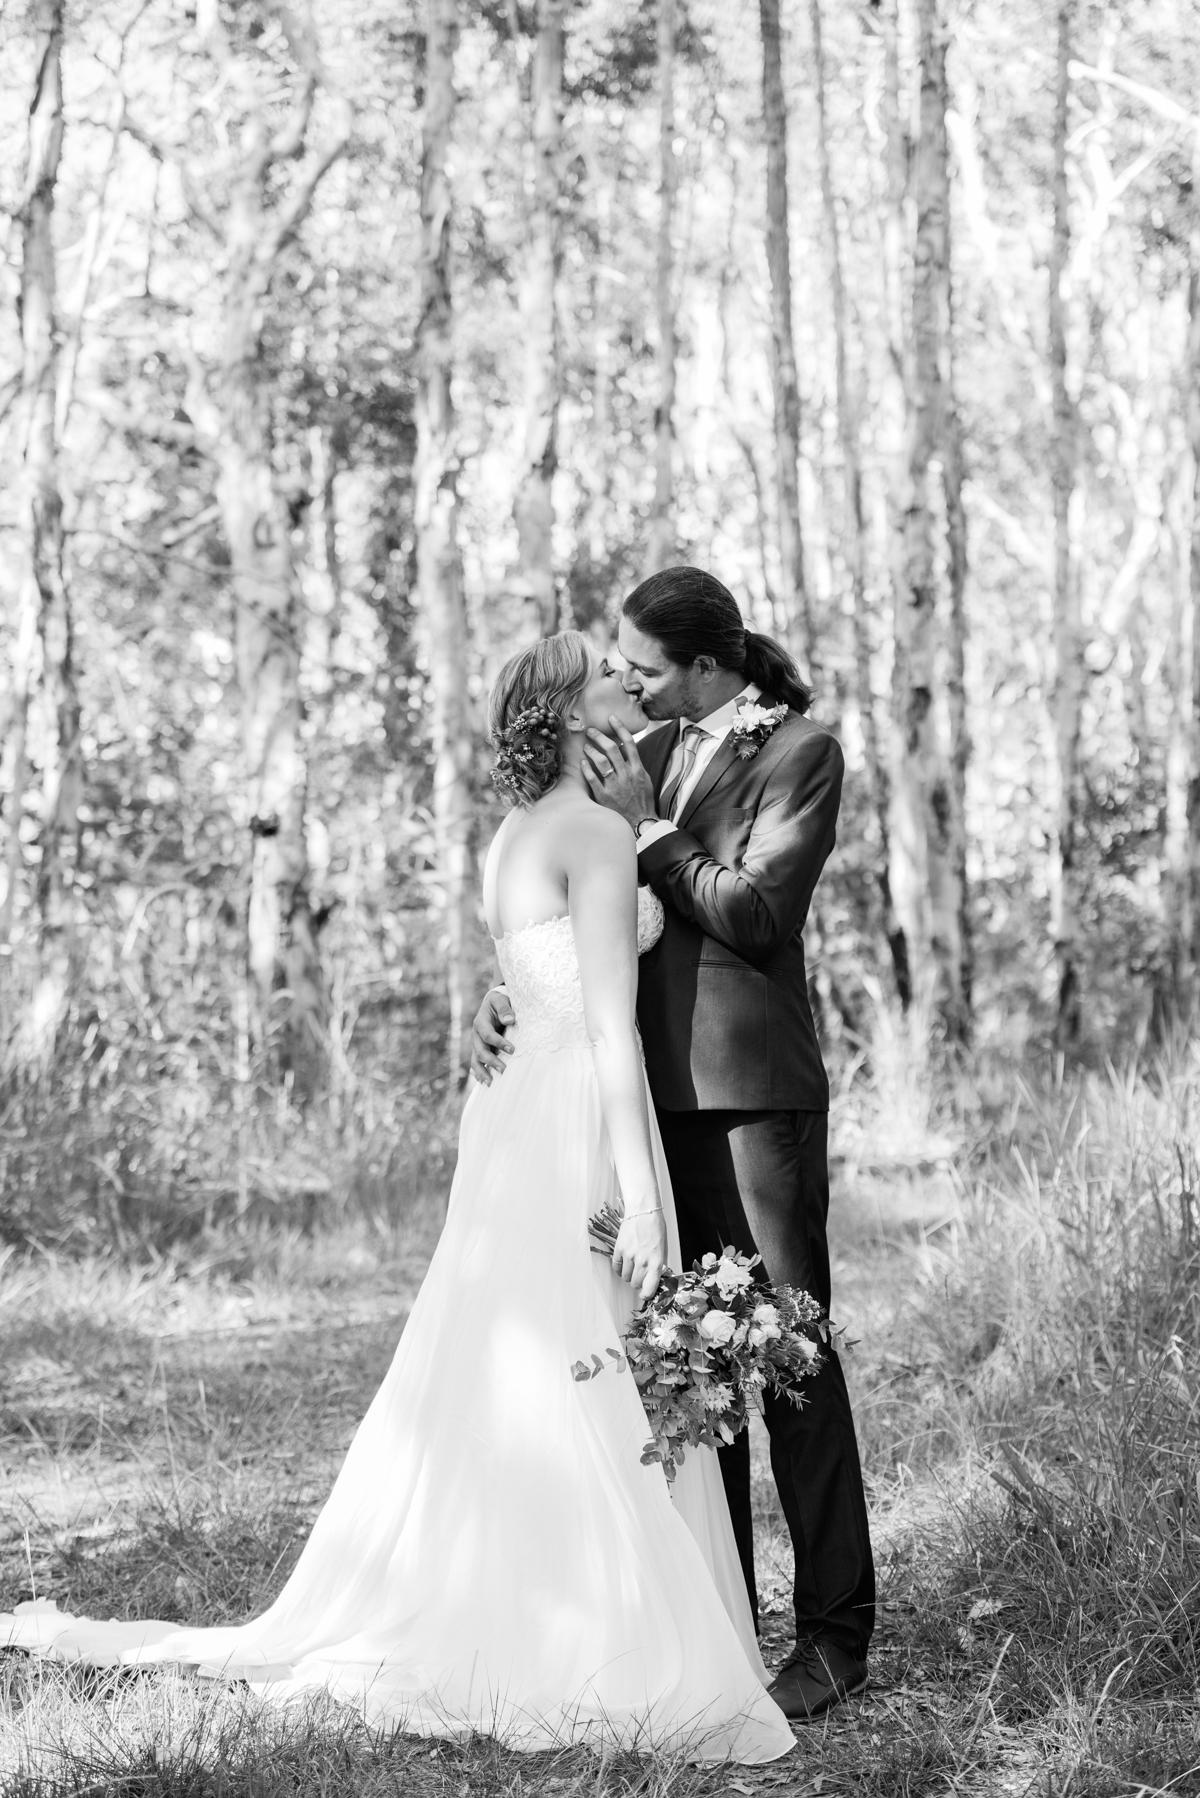 Cass and Josh- wedding photographer, byron bay wedding and family photographer, tweed heads wedding and family photography-533.jpg